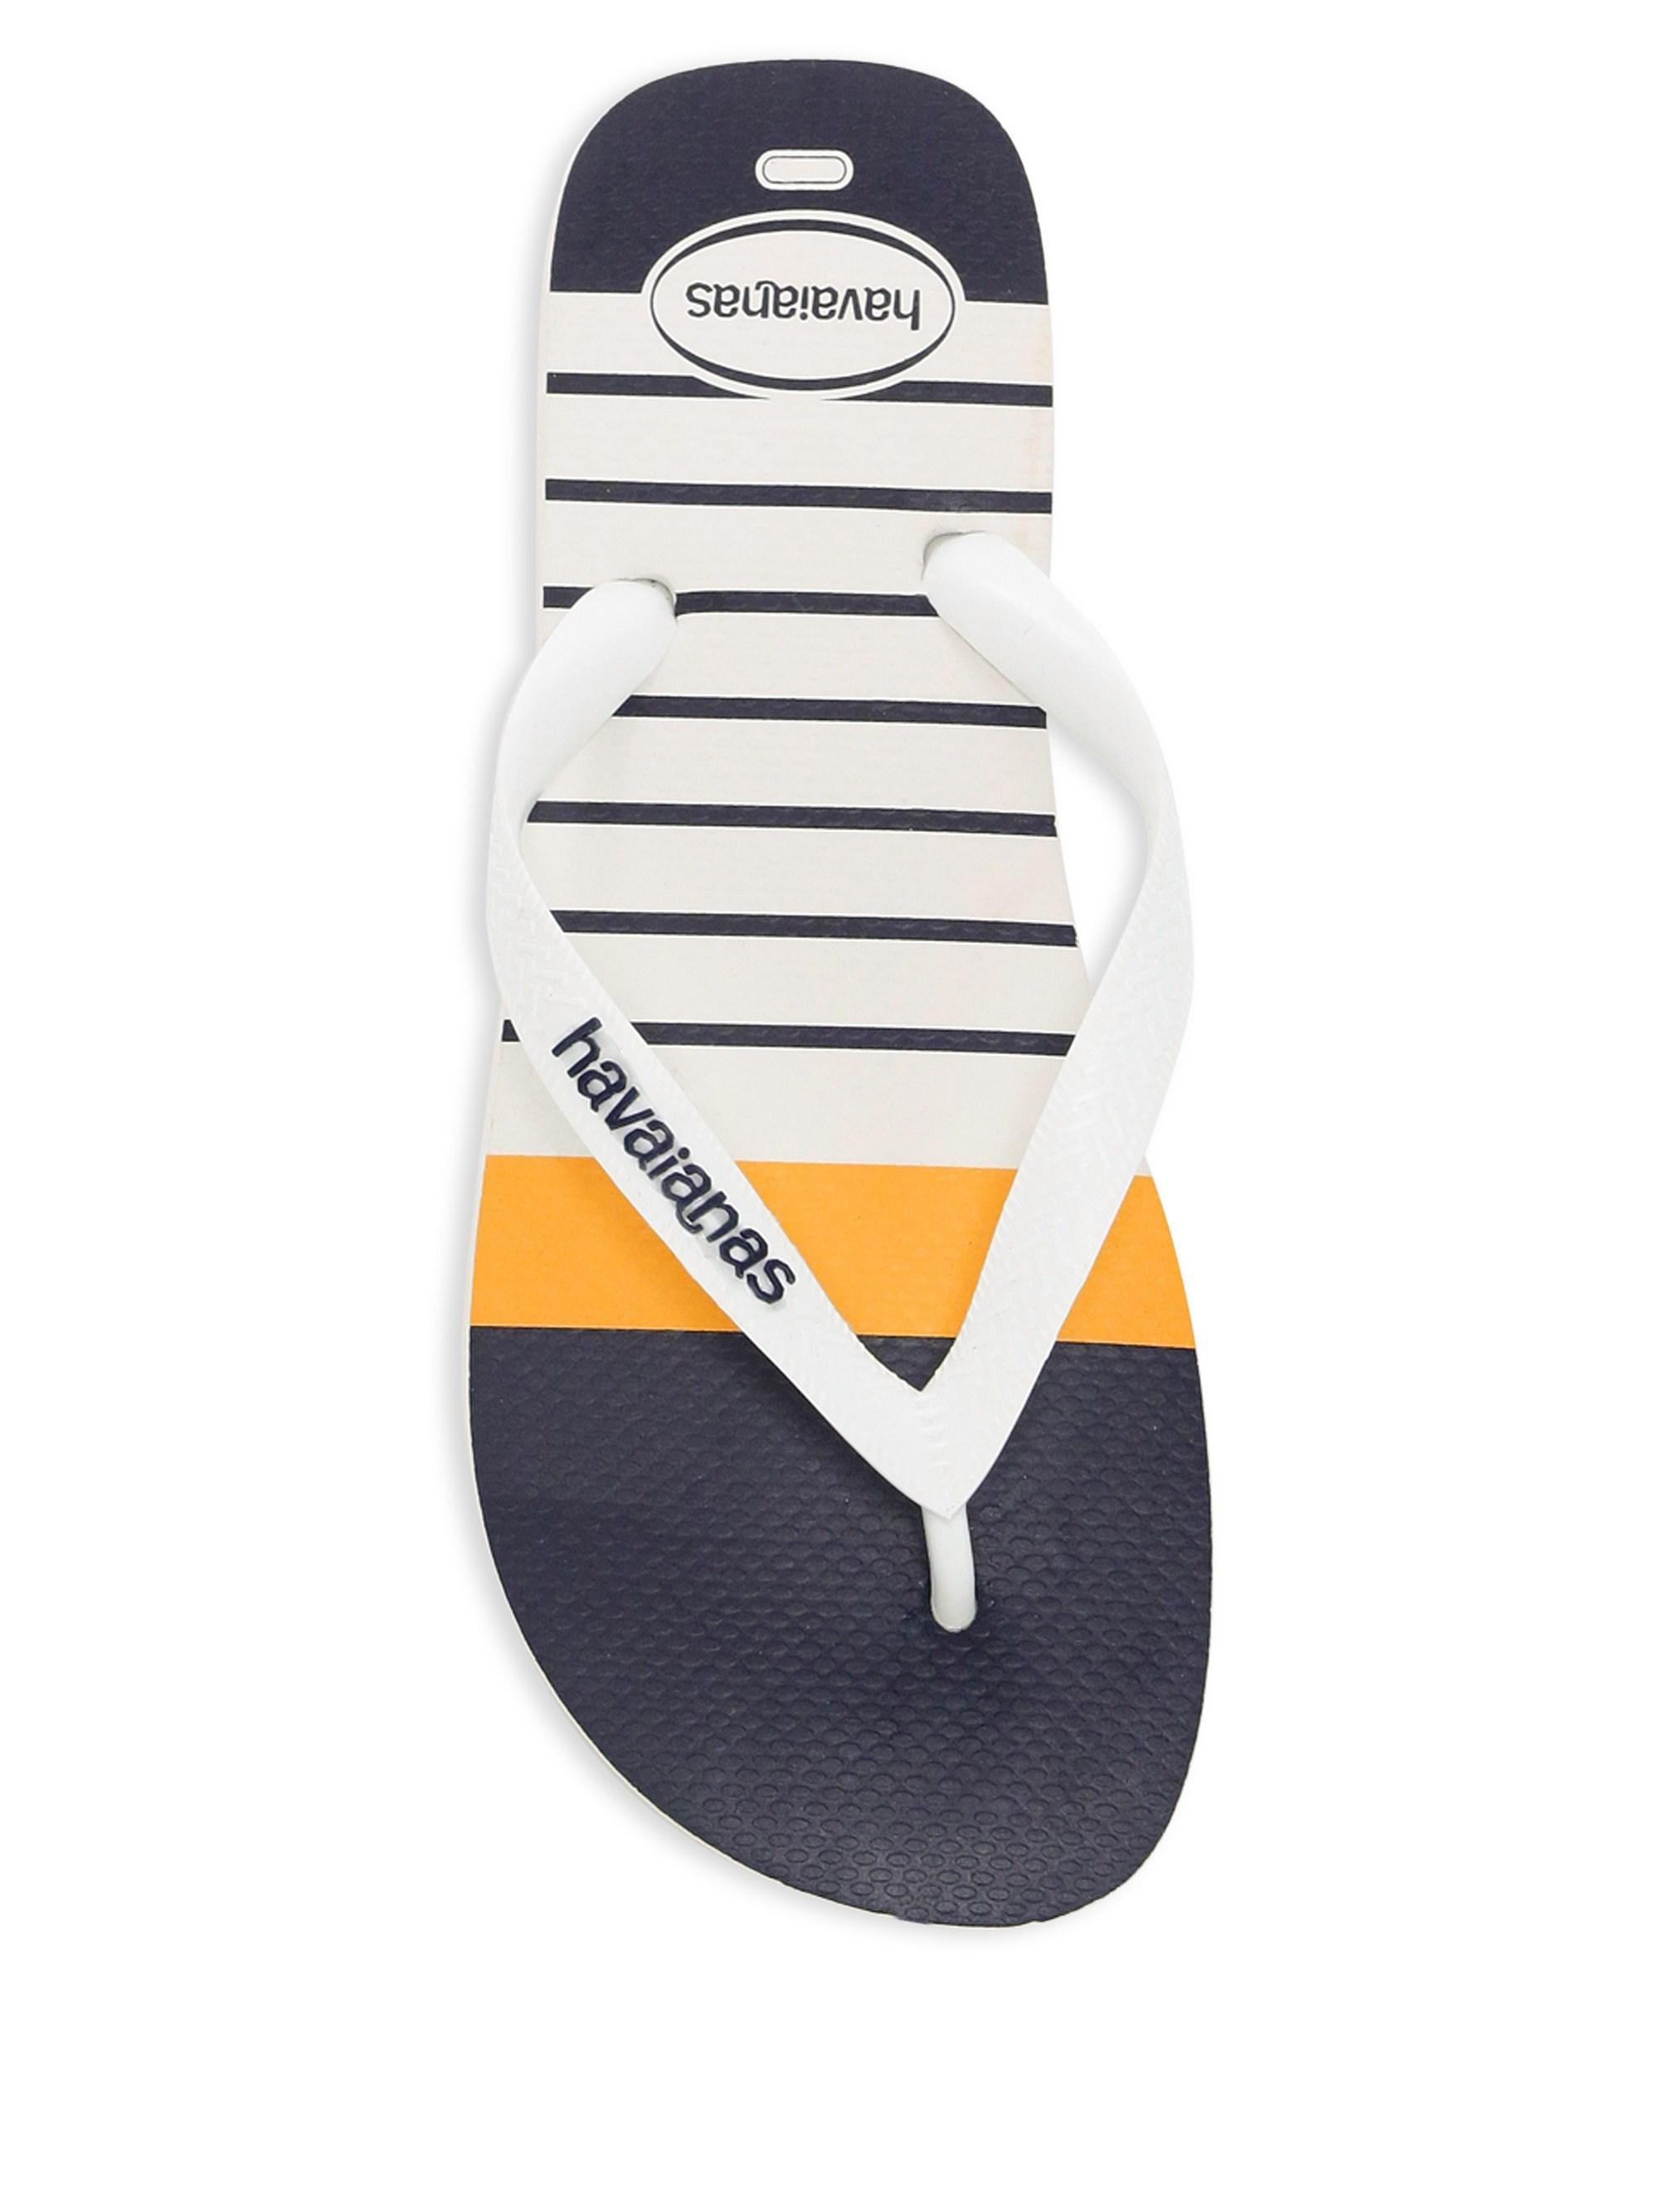 026e3f2656e Lyst - Havaianas Men s Nautical Thong Flip-flops - White - Size 45 ...